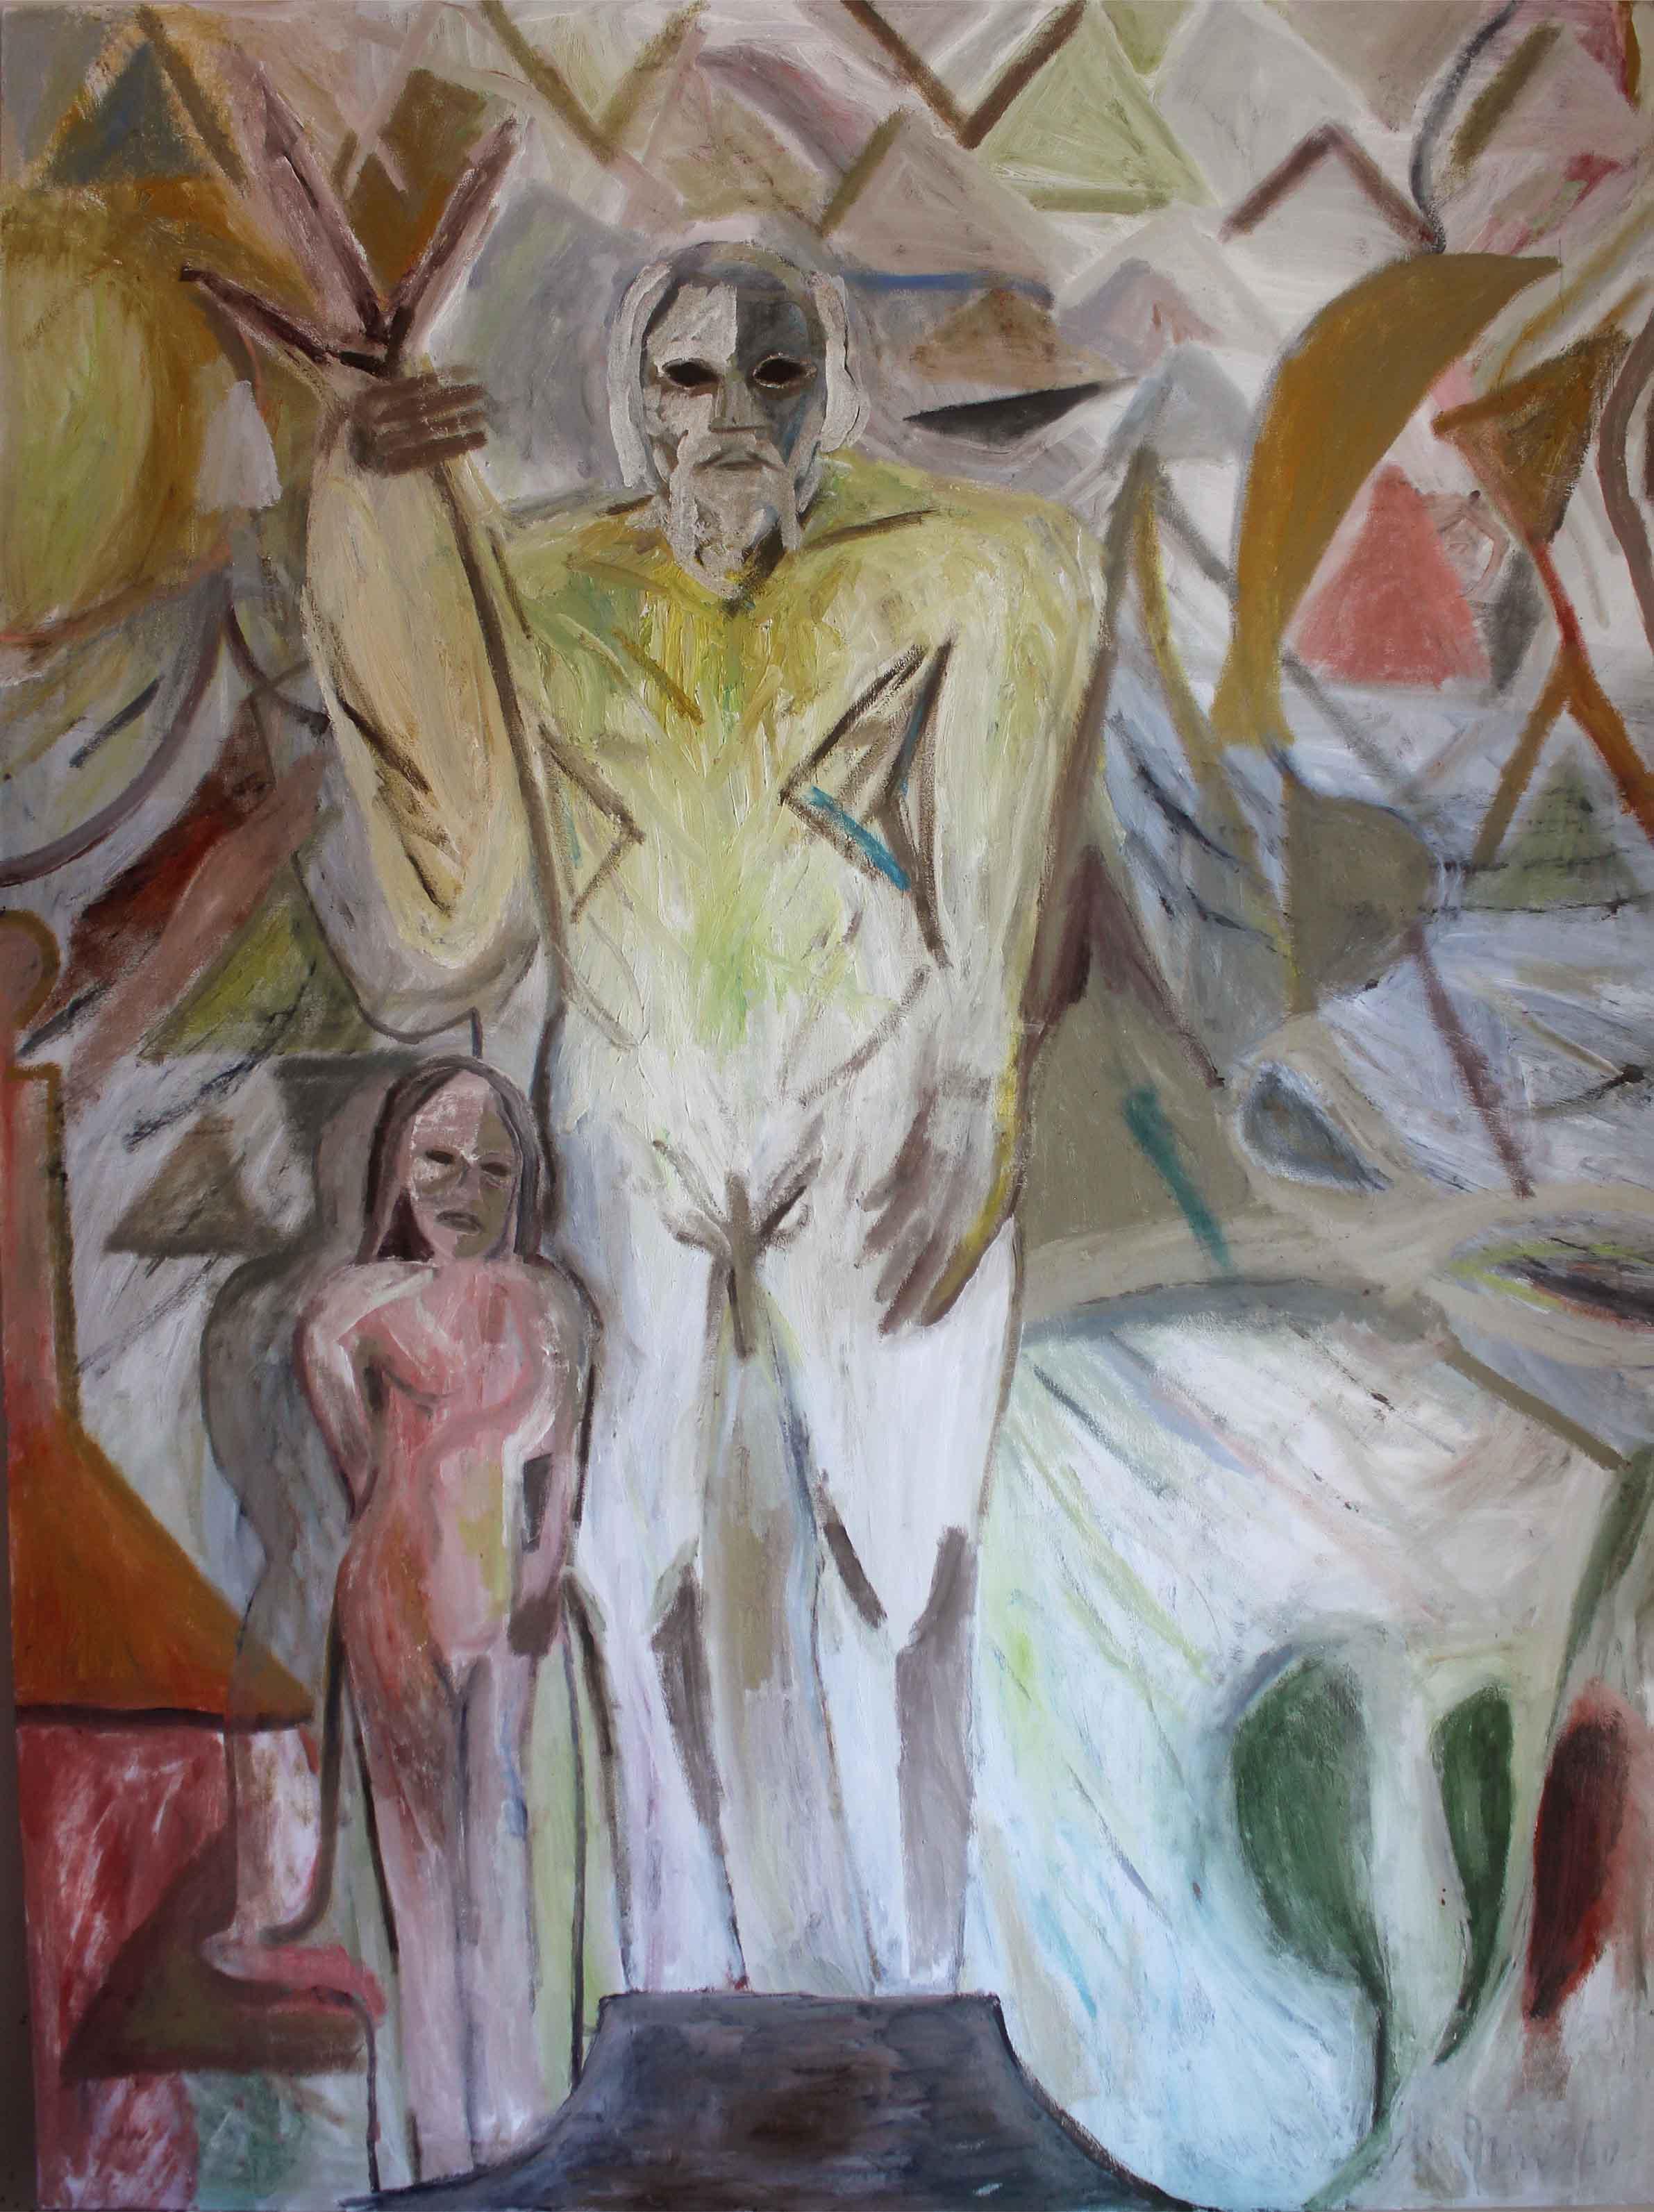 Justin Williams, Devola, 2017, oil, pigment, sand, enamel on canvas, 152 x 203 cm .jpg